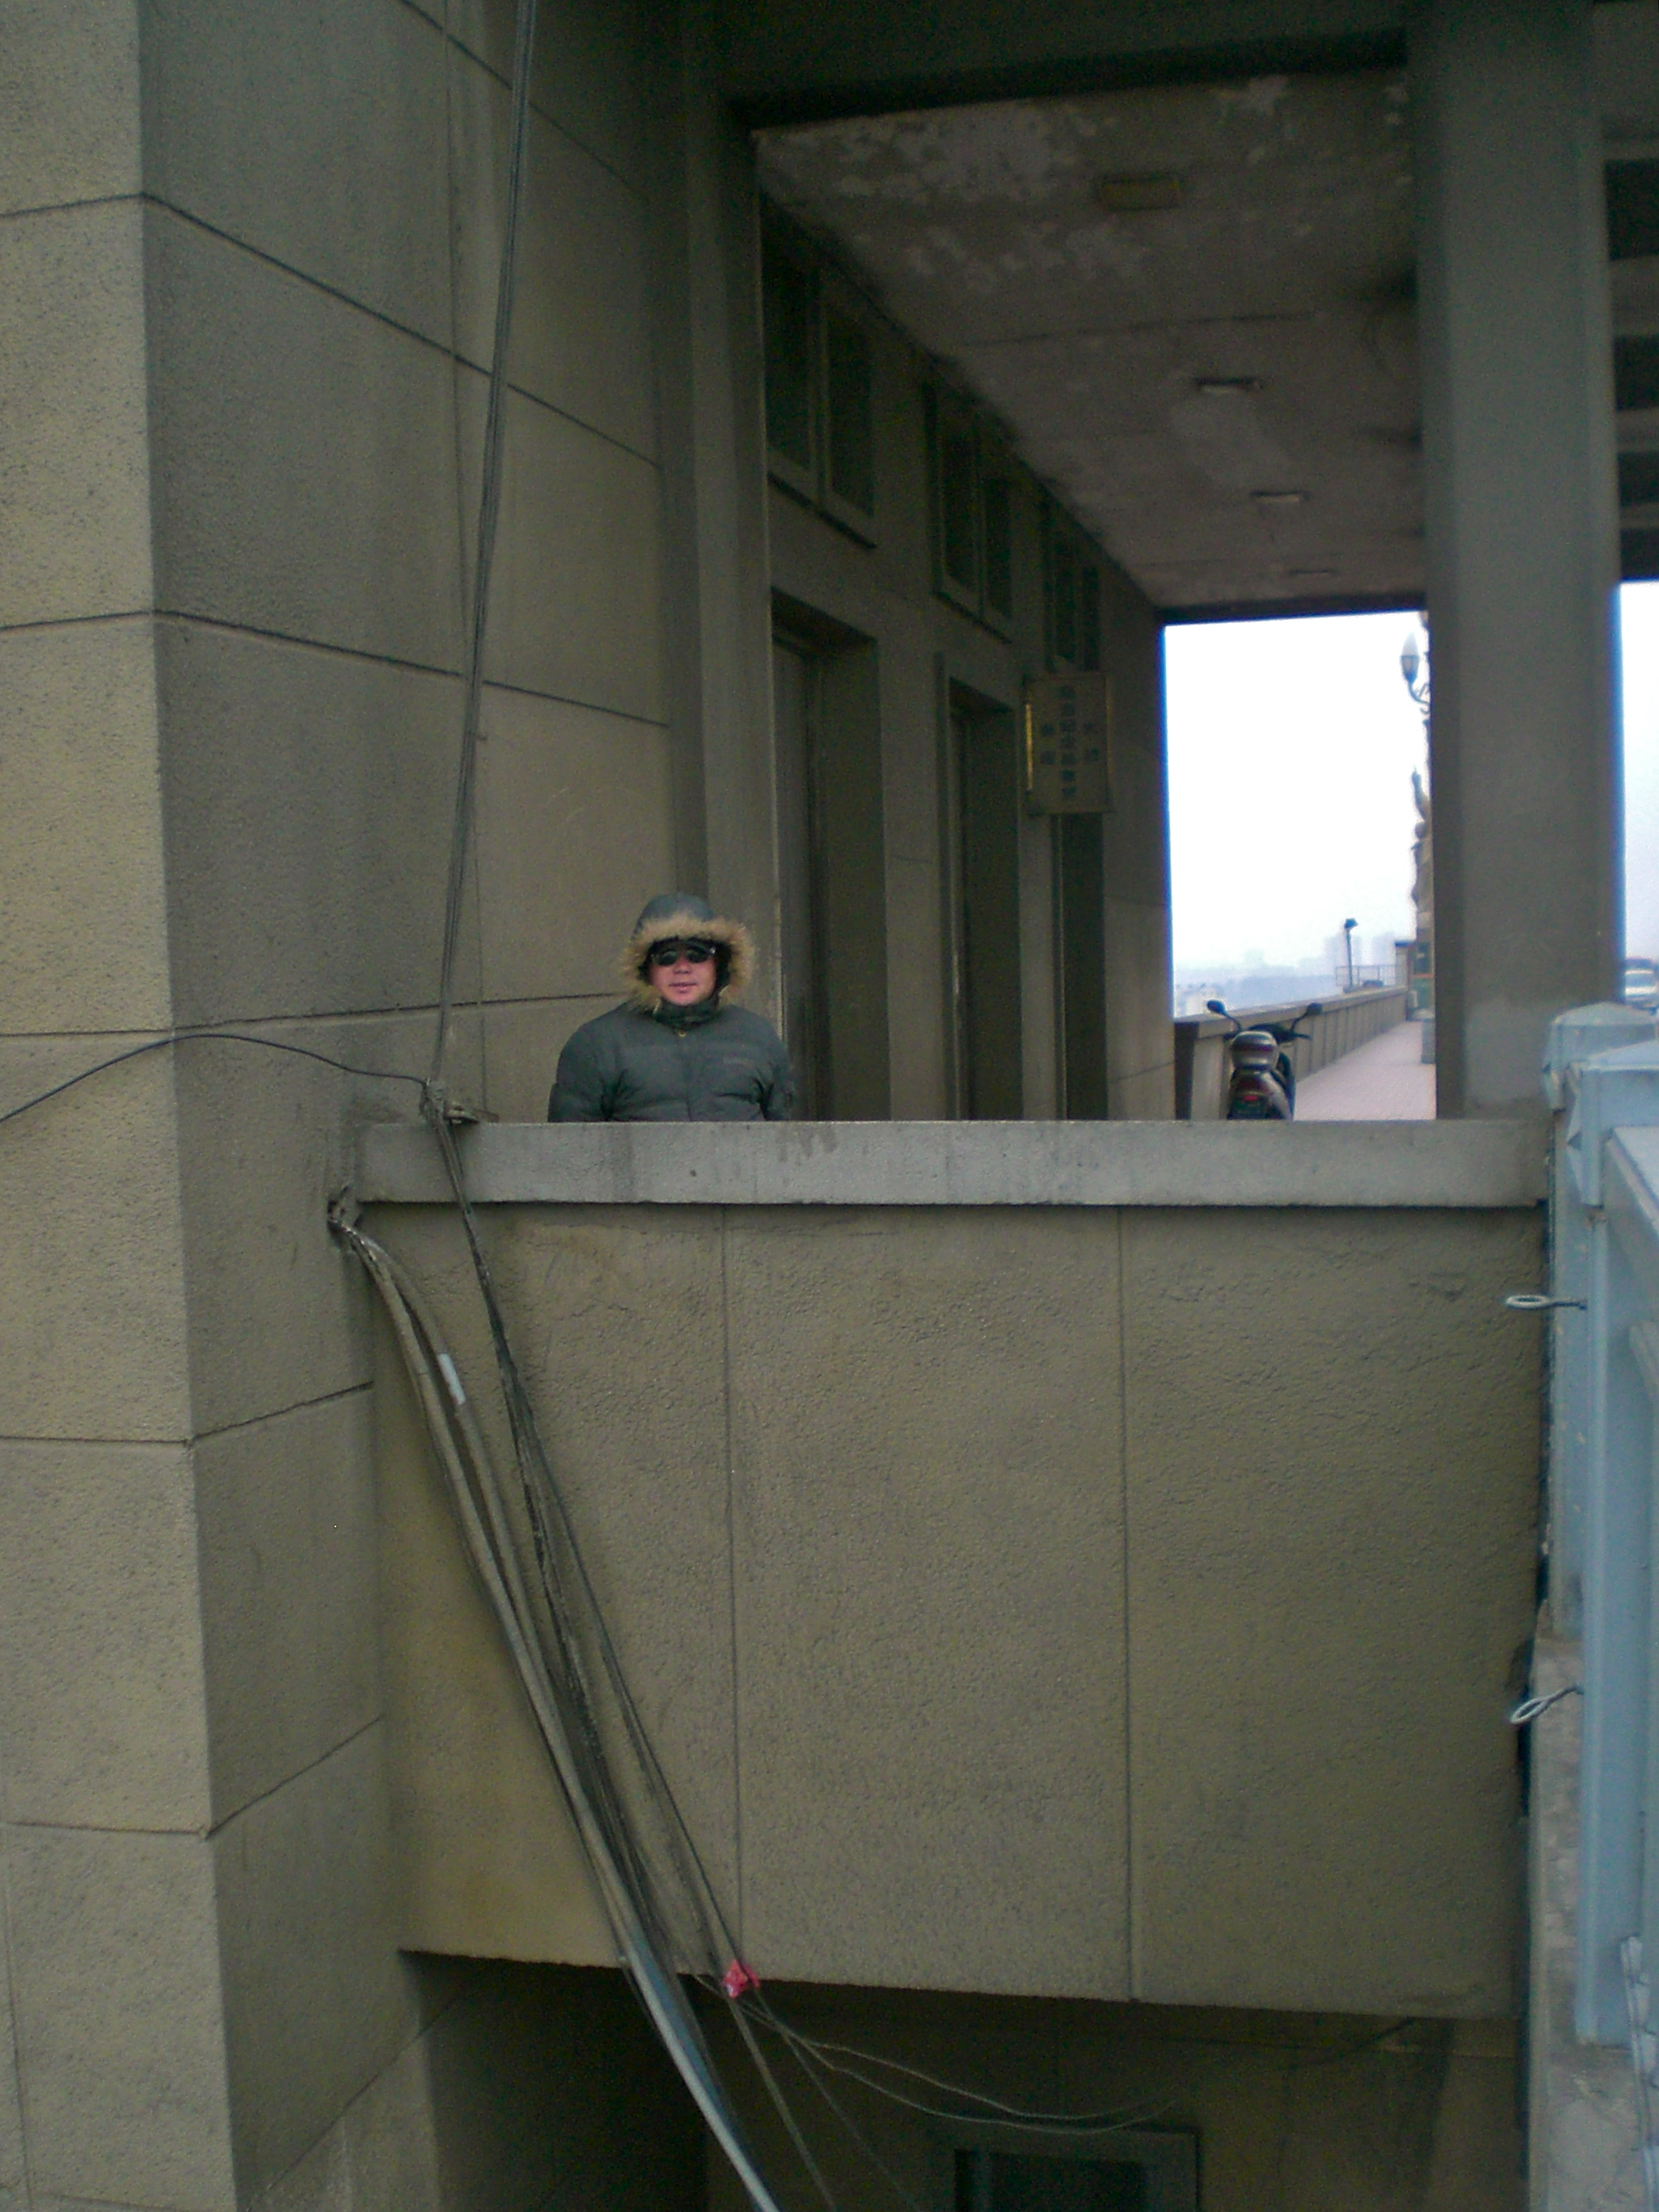 Chen Si on the Yangtze River Bridge in Nanjing, China. (C) Remko Tanis